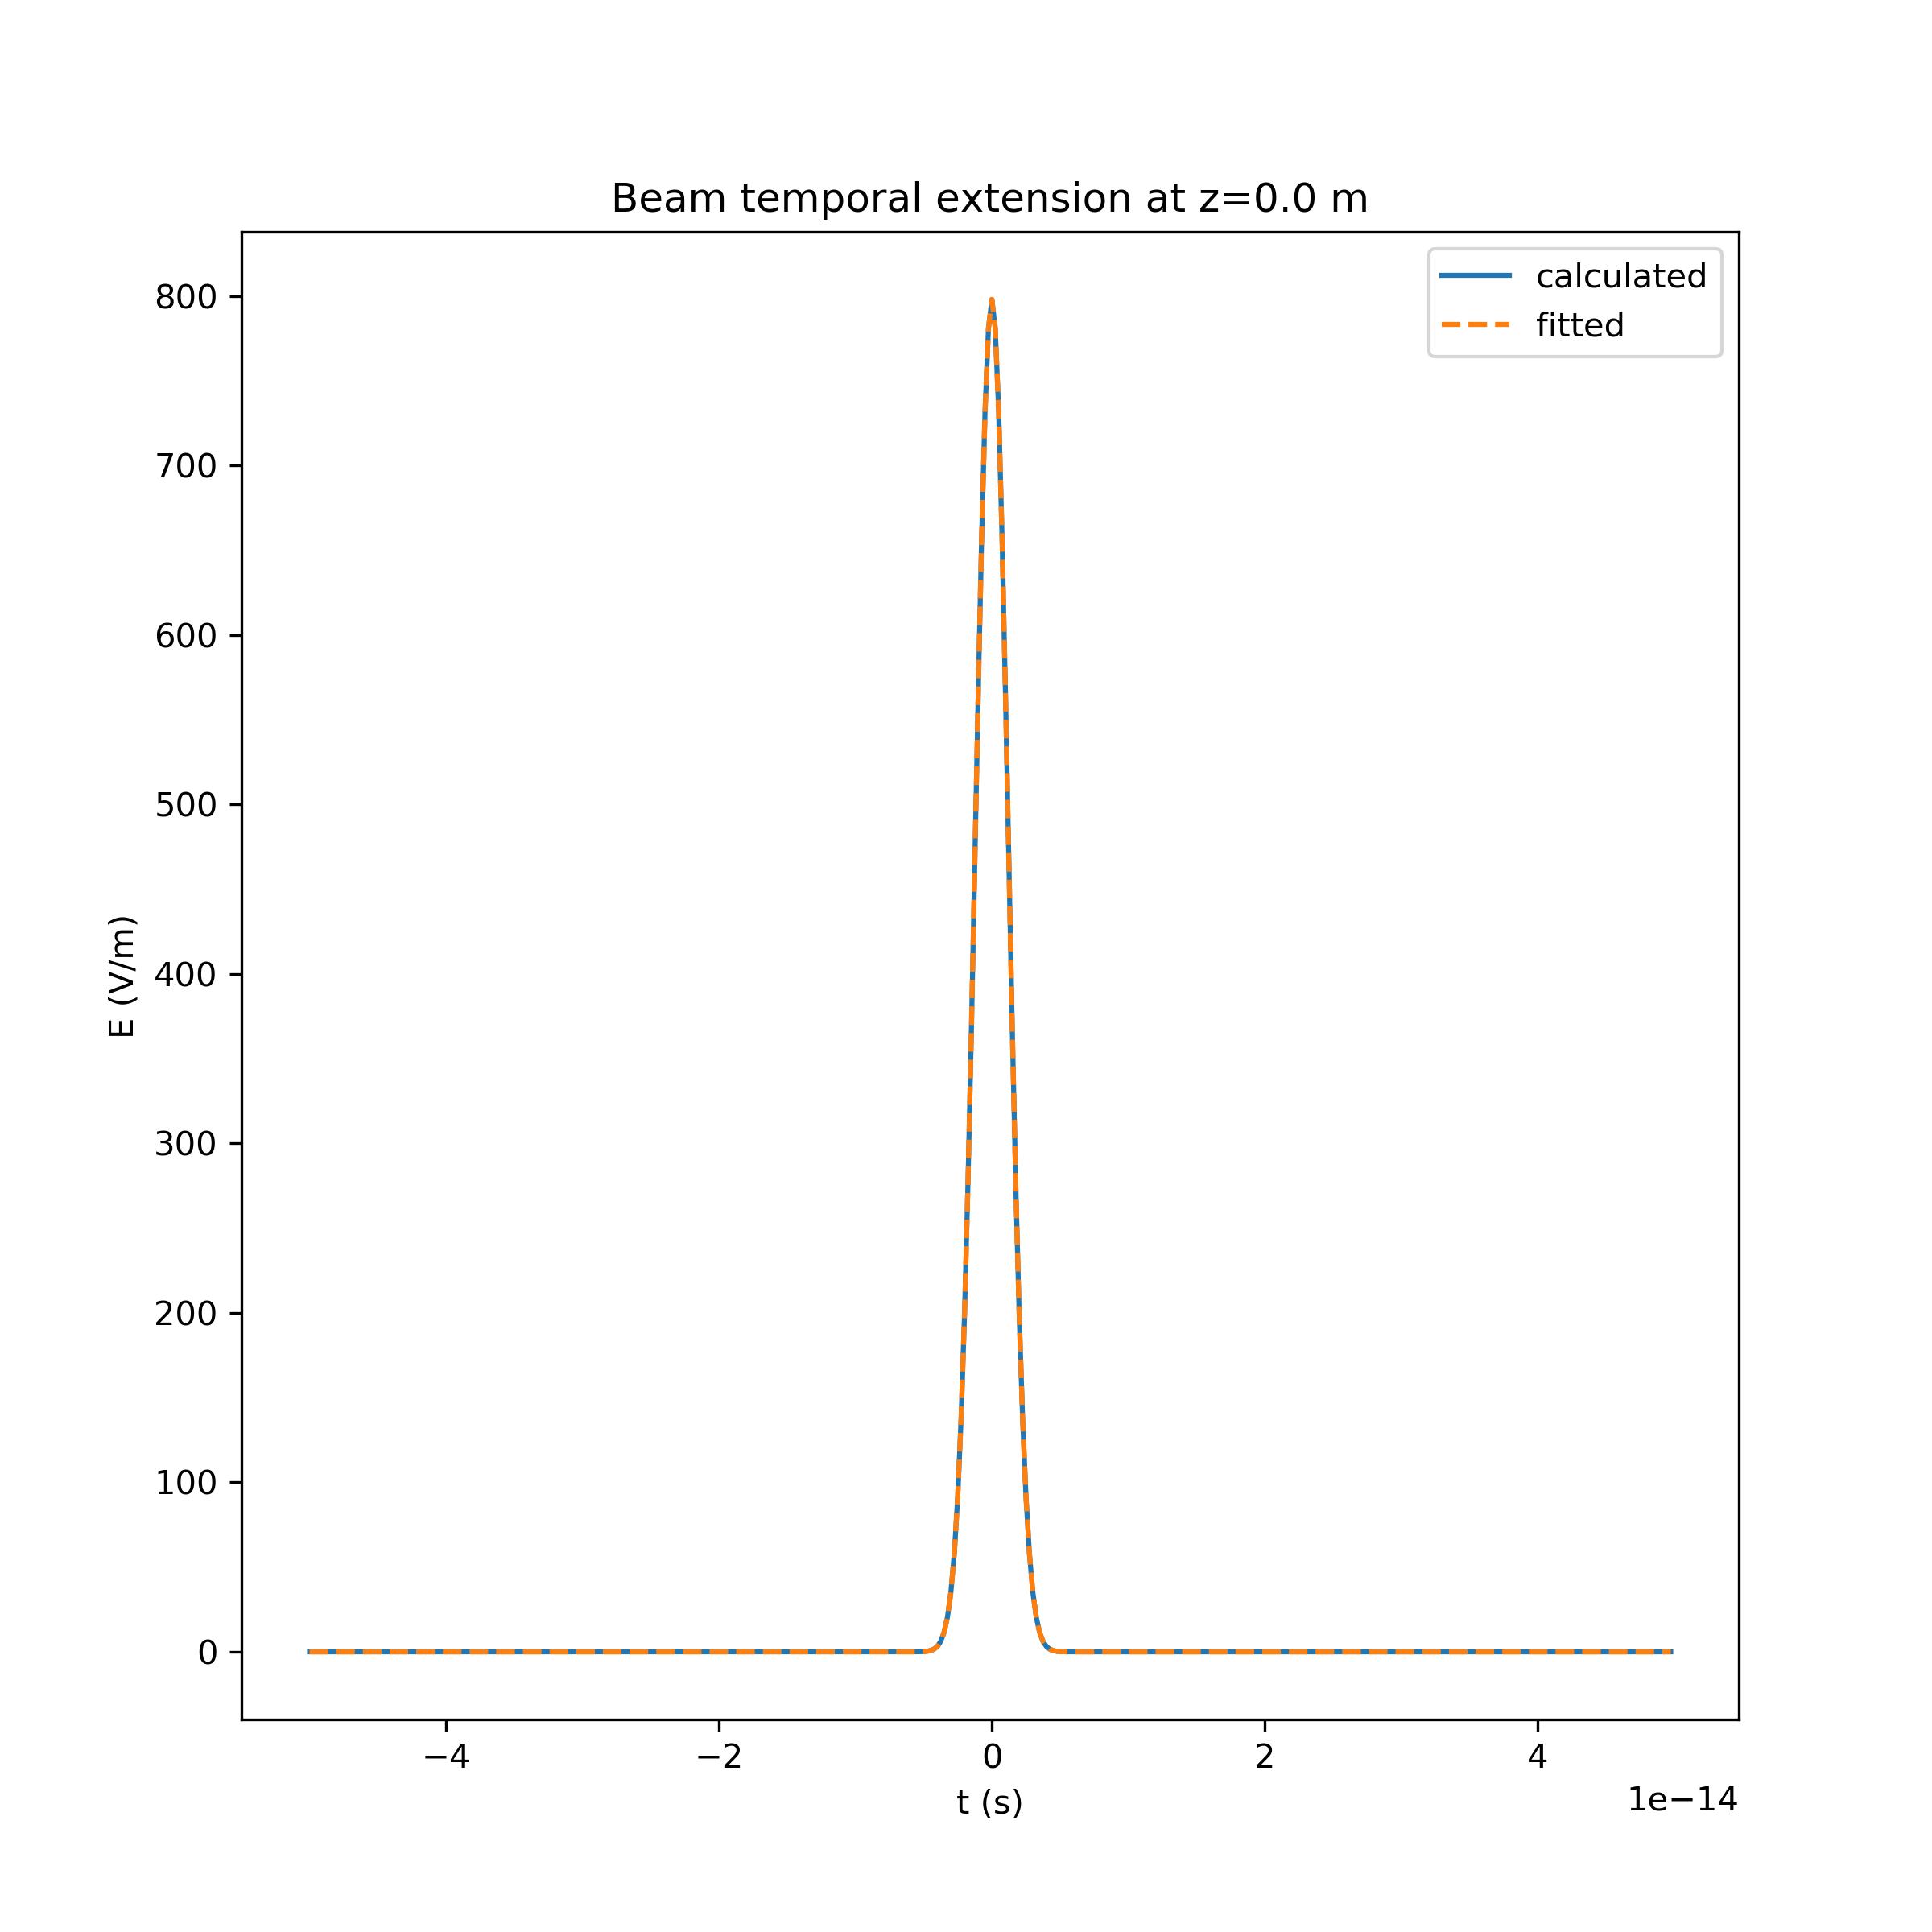 figures/HSCN/temp_fit_init.png